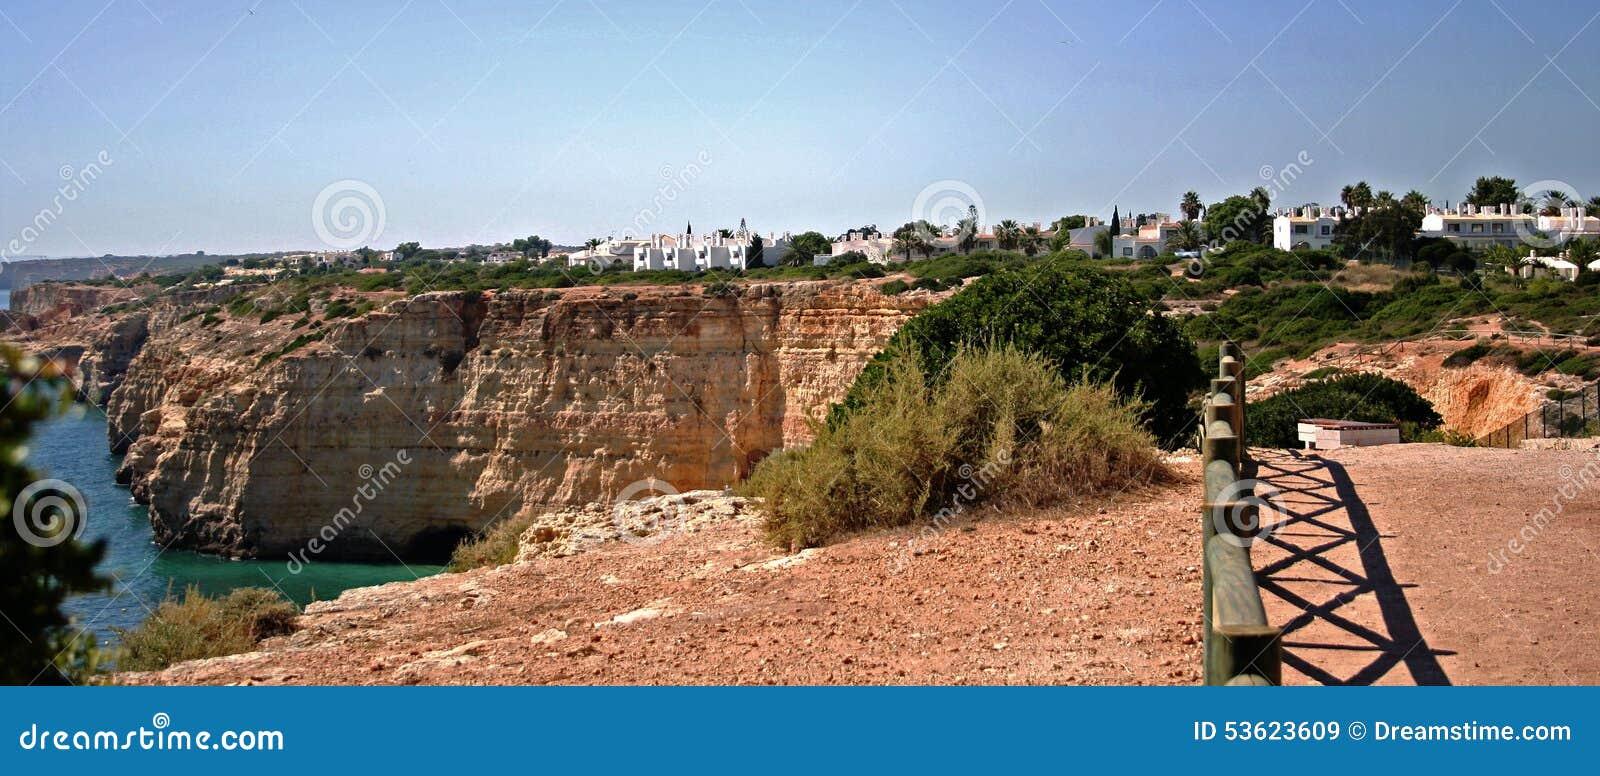 Sea at the coast of Algarve, Portugal stock photo